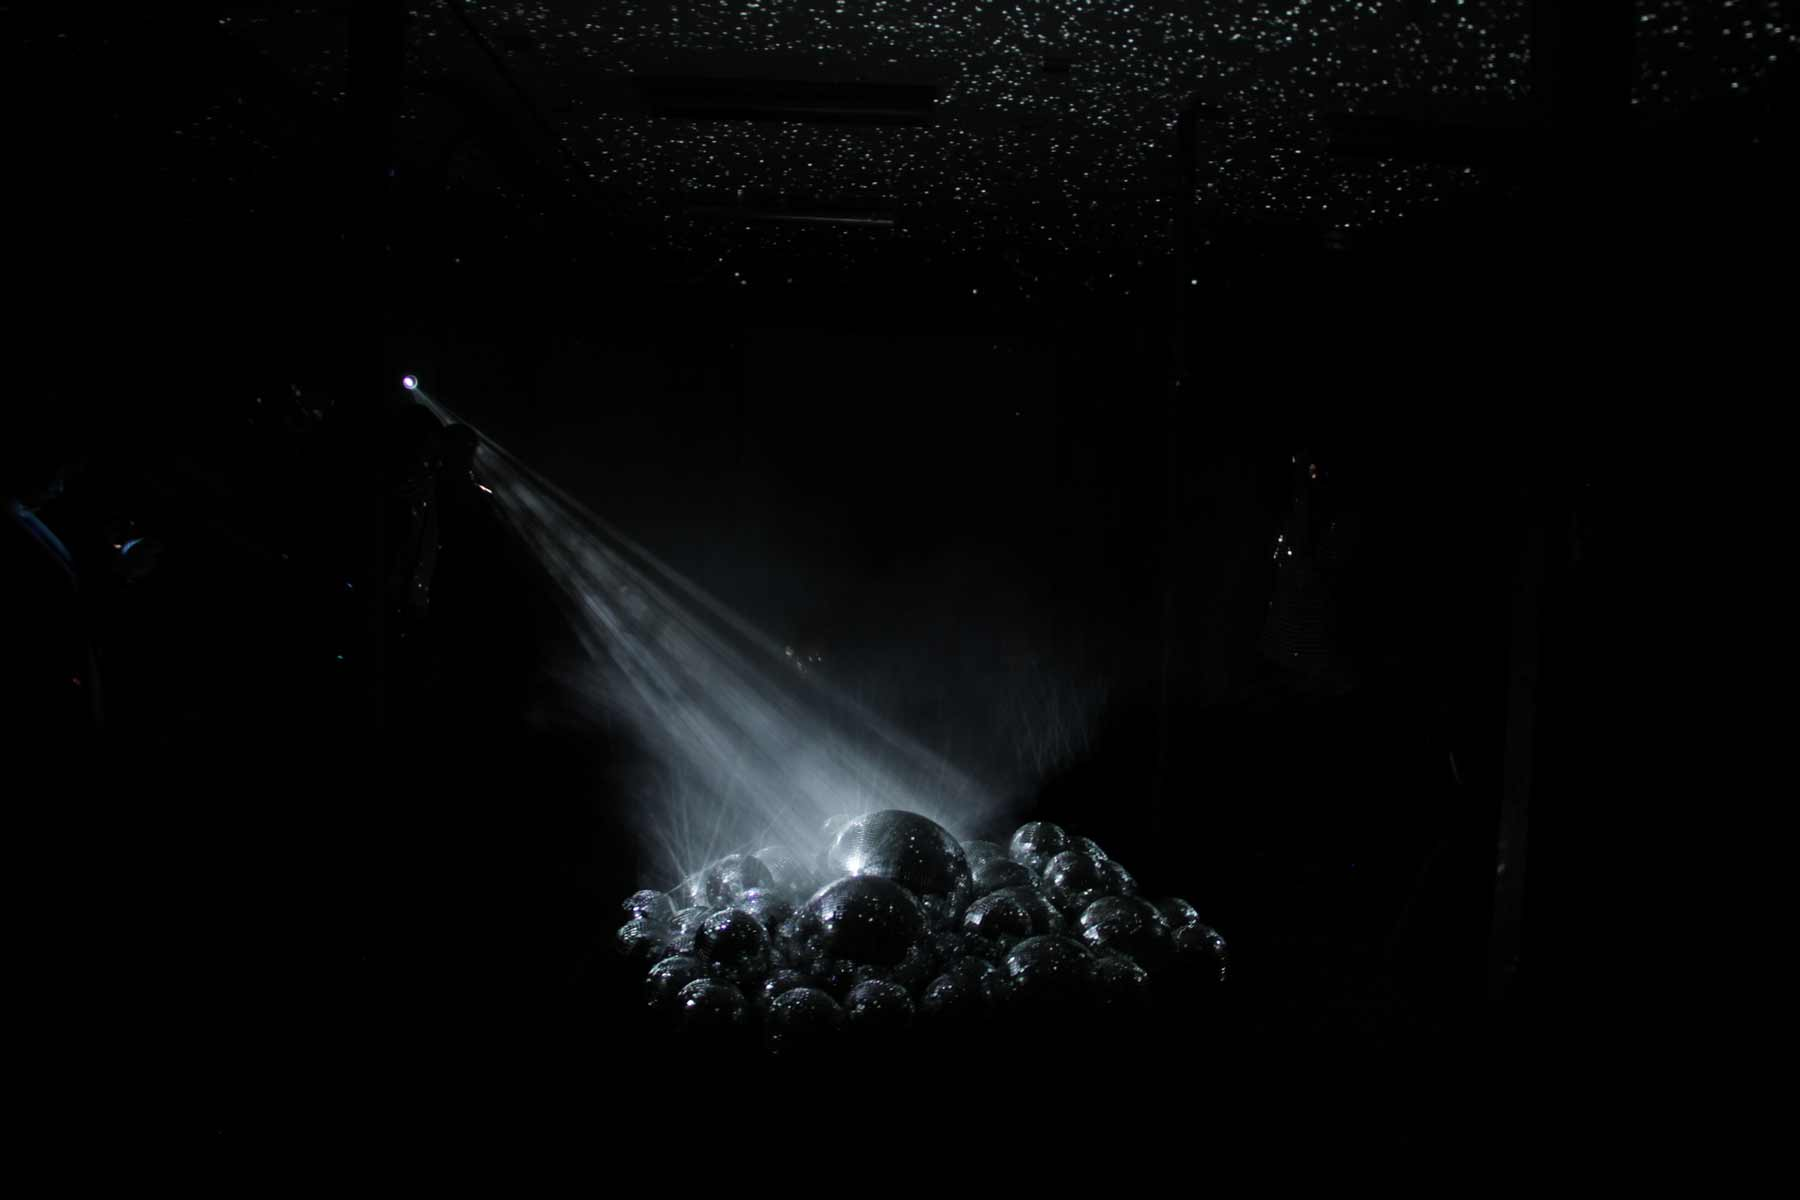 50 Discokugeln in einem Raum light-leaks-discokugeln_03